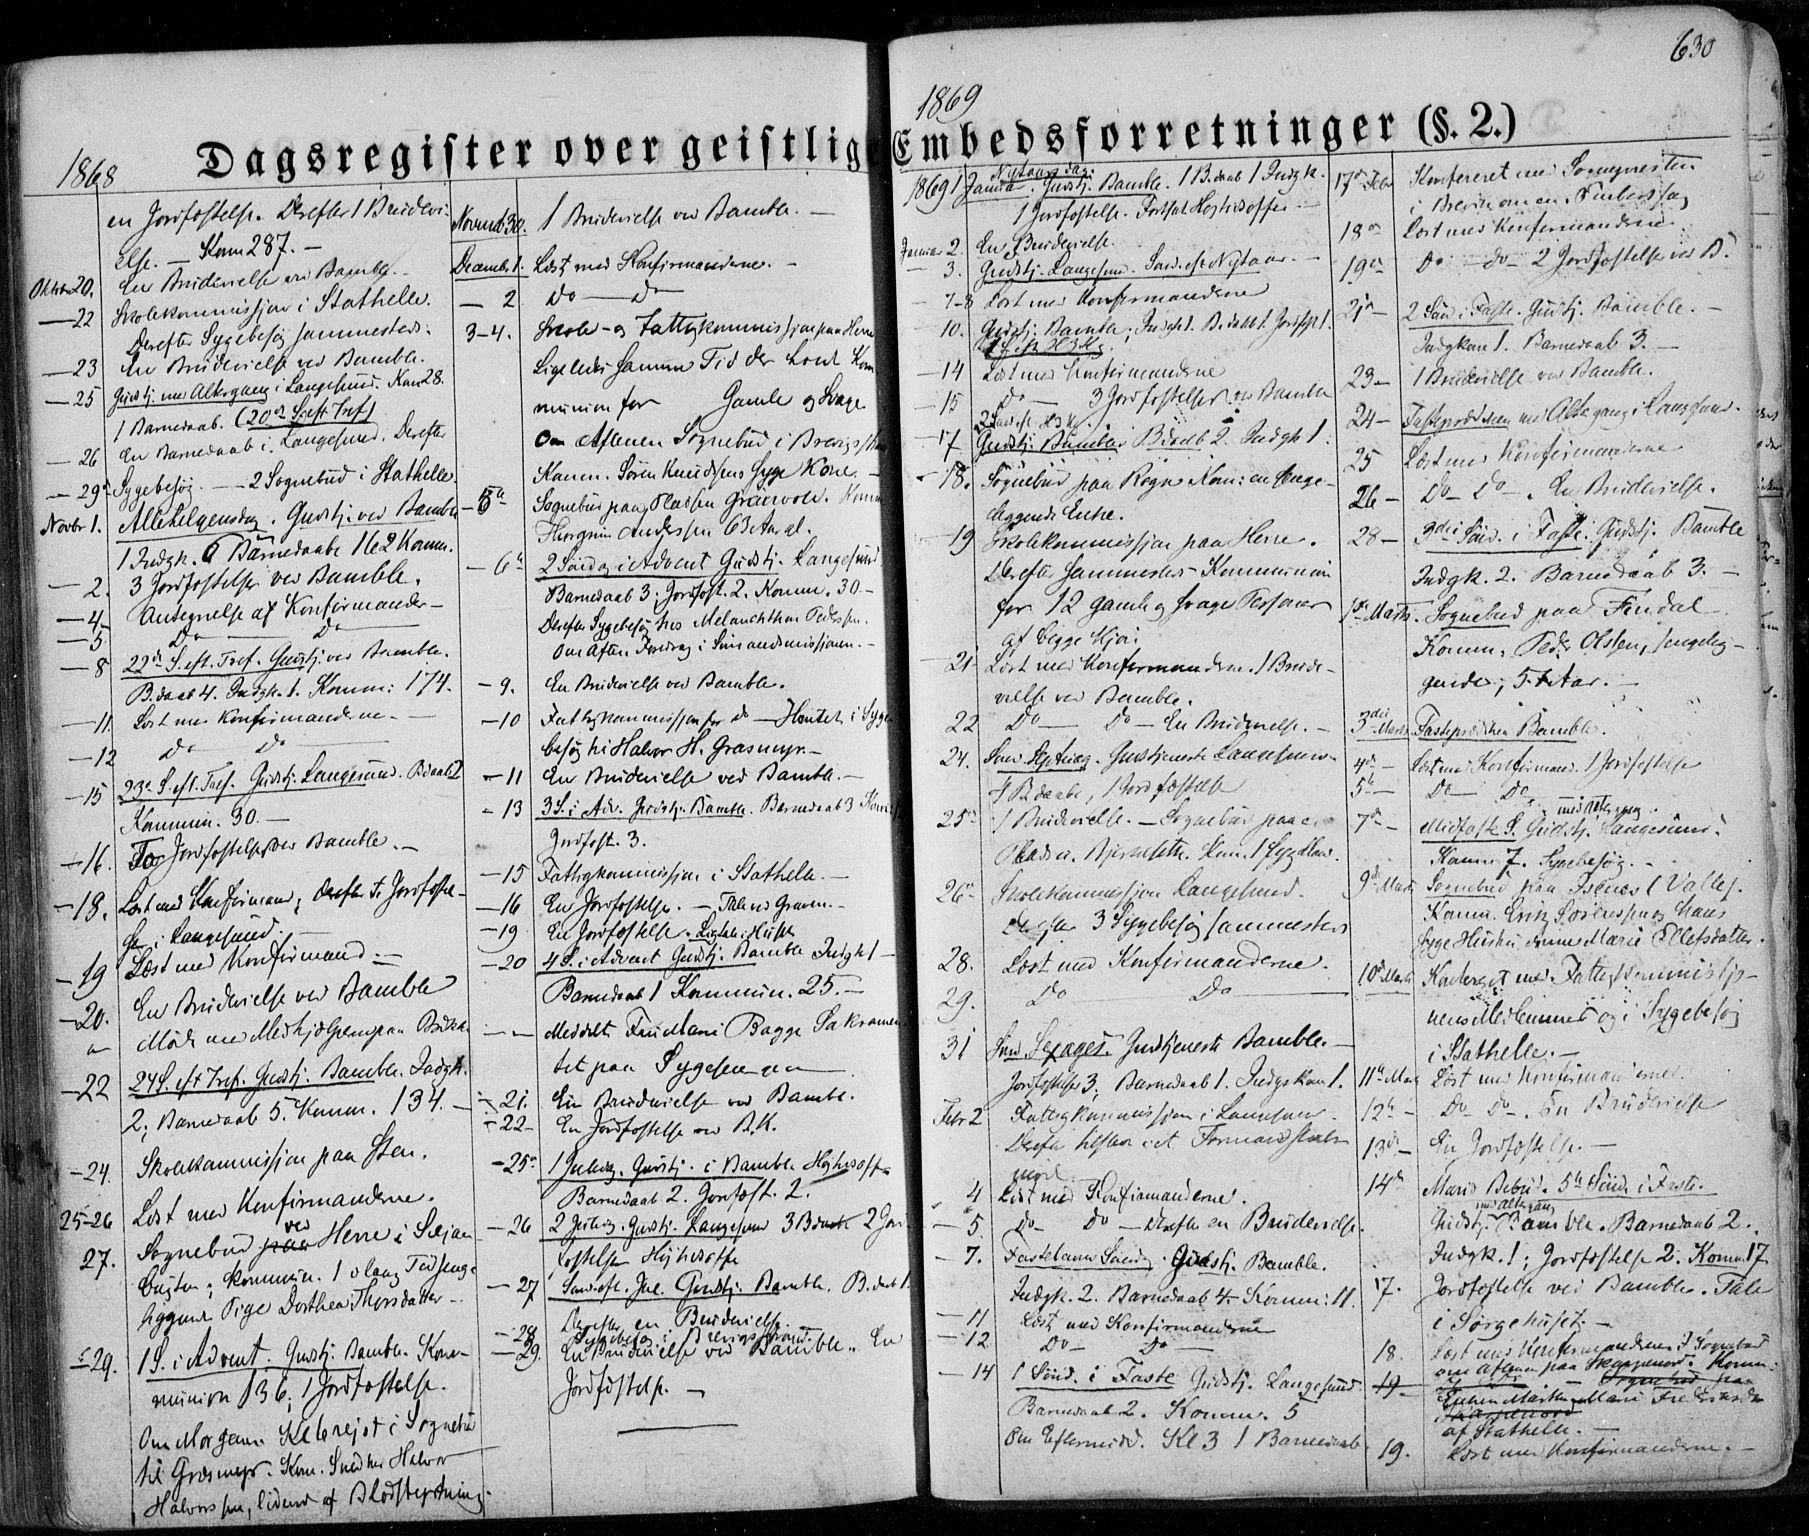 SAKO, Bamble kirkebøker, F/Fa/L0005: Ministerialbok nr. I 5, 1854-1869, s. 630